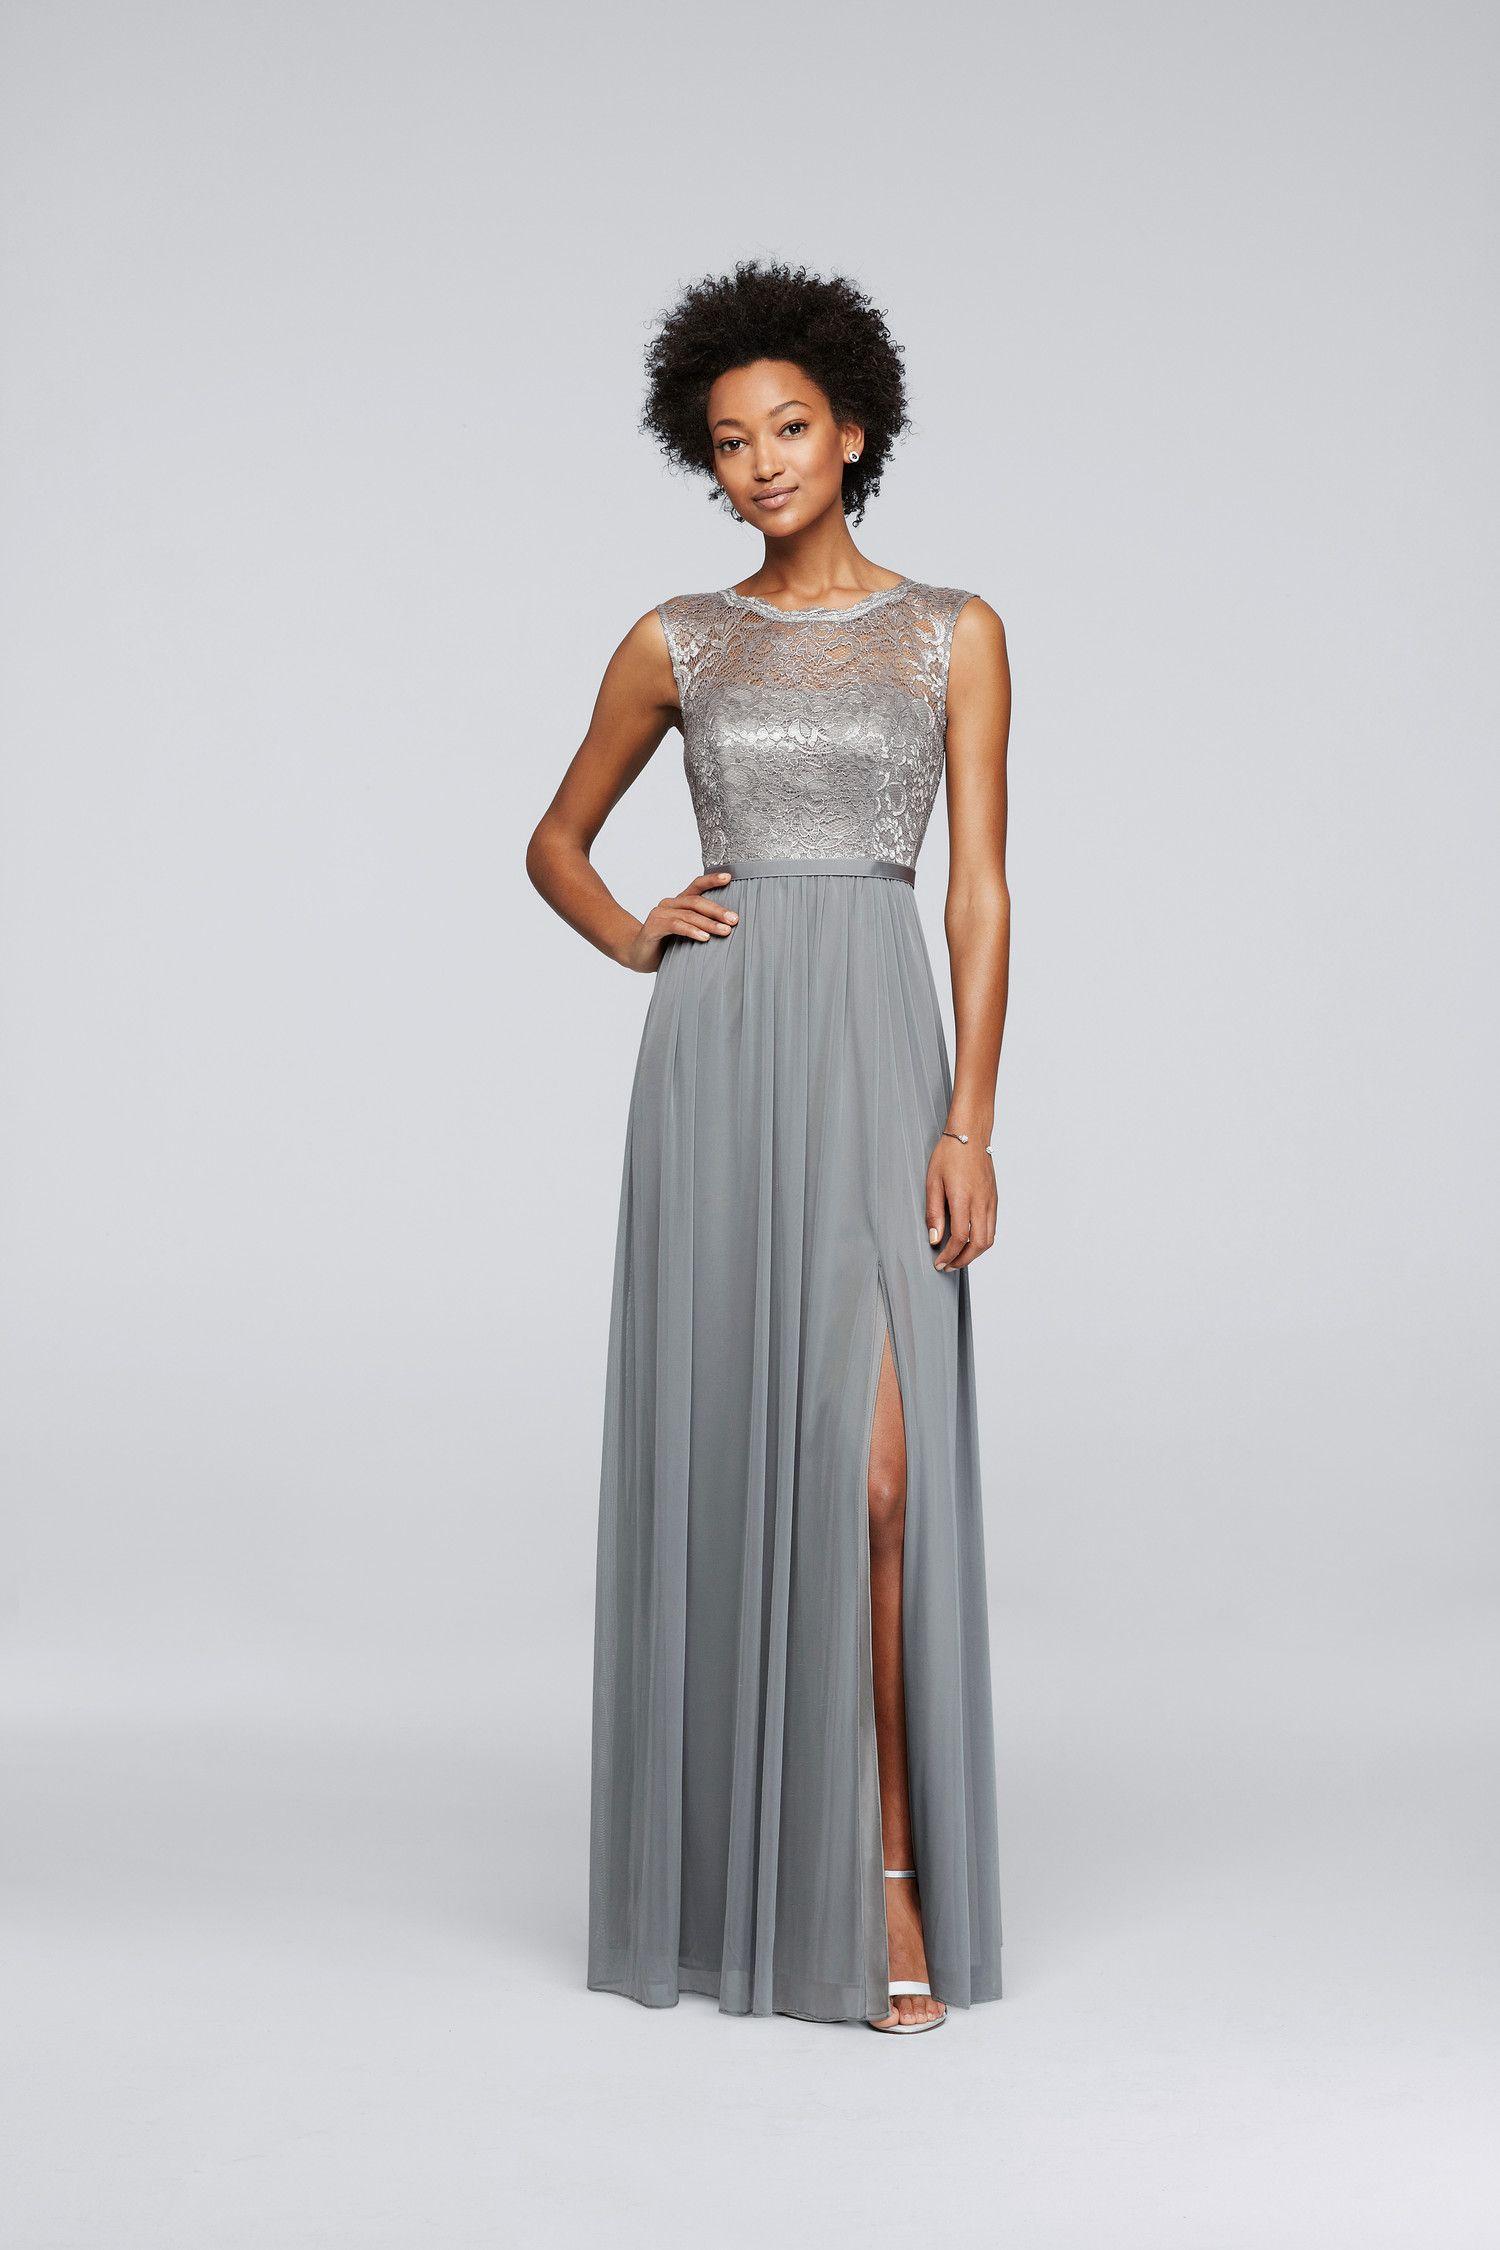 11++ Davids bridal silver dress info